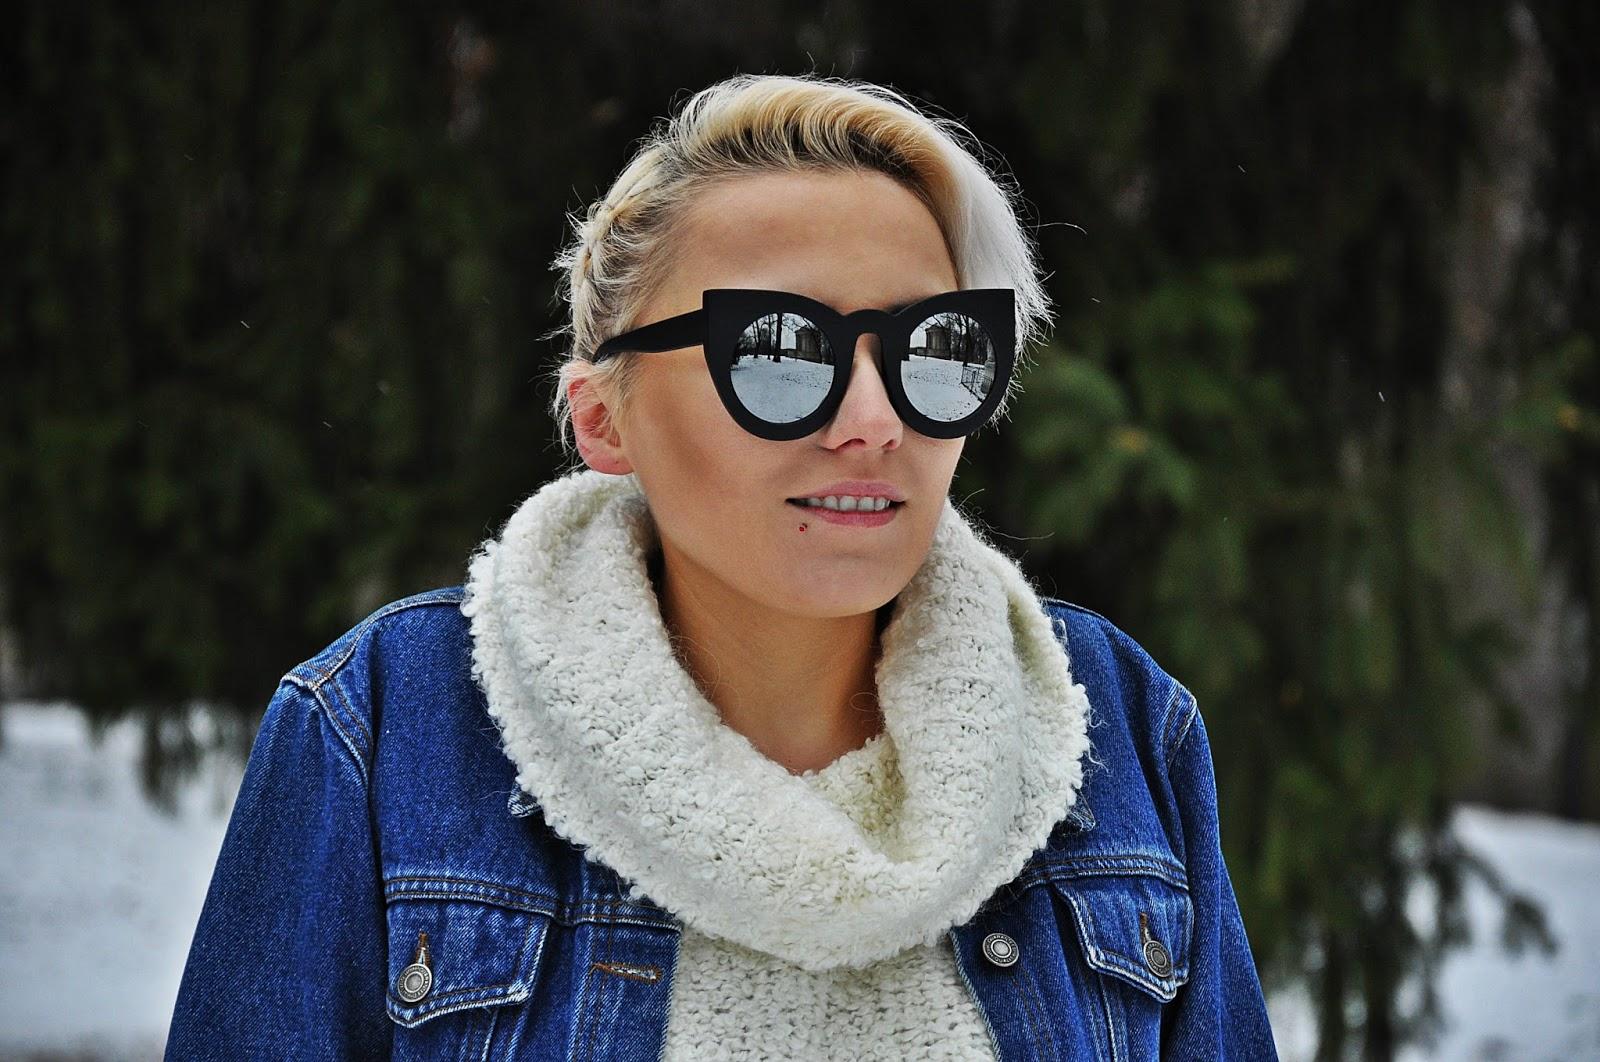 blogerka_modowa_blog_modowy_karyn_pulawy_250117